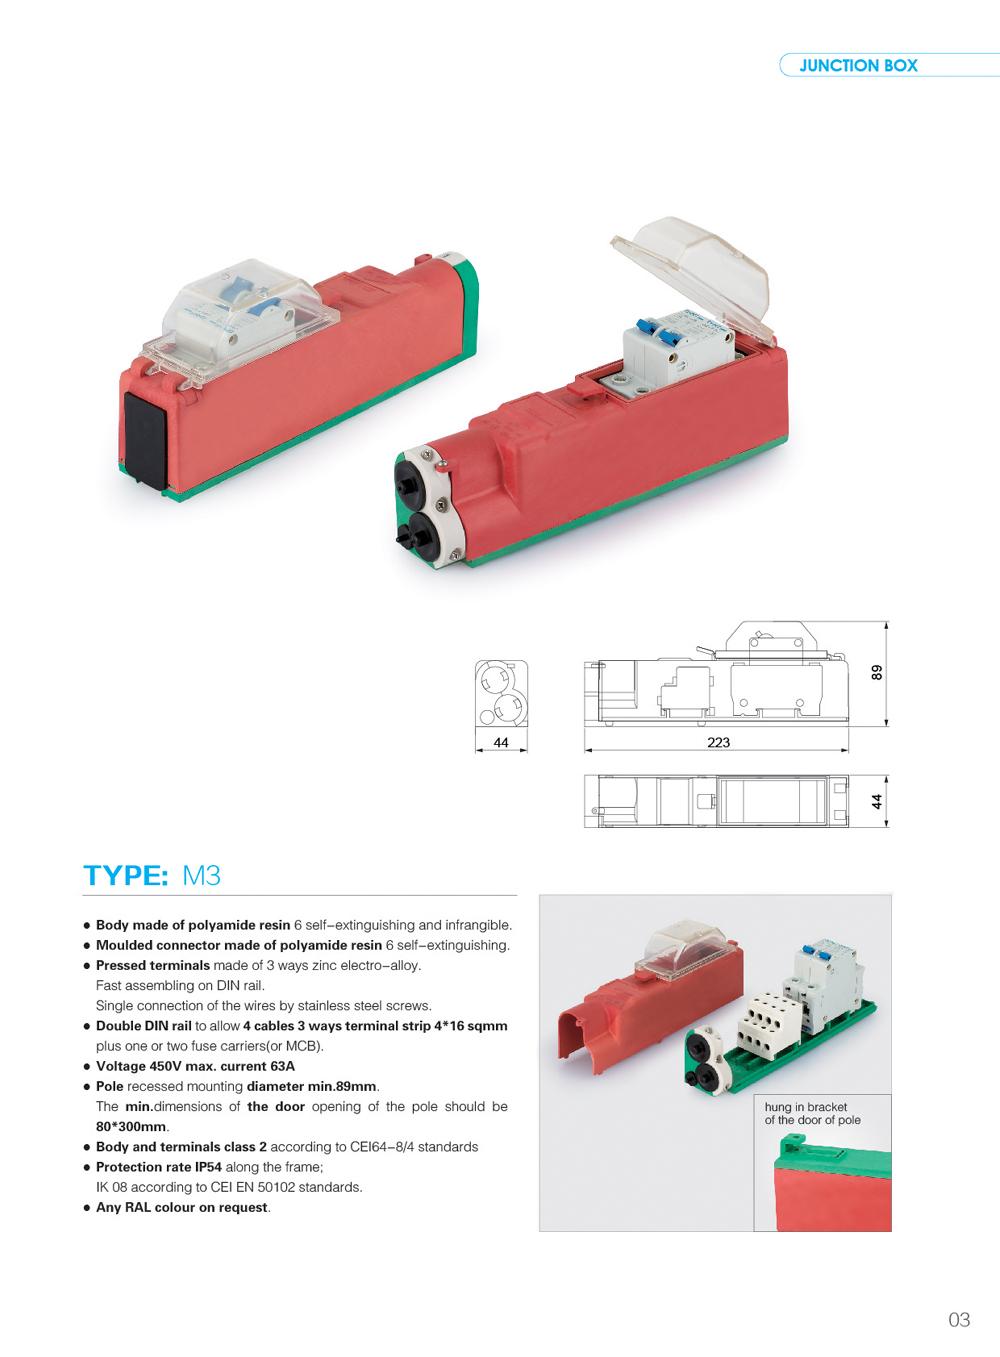 M3 Fuse Box